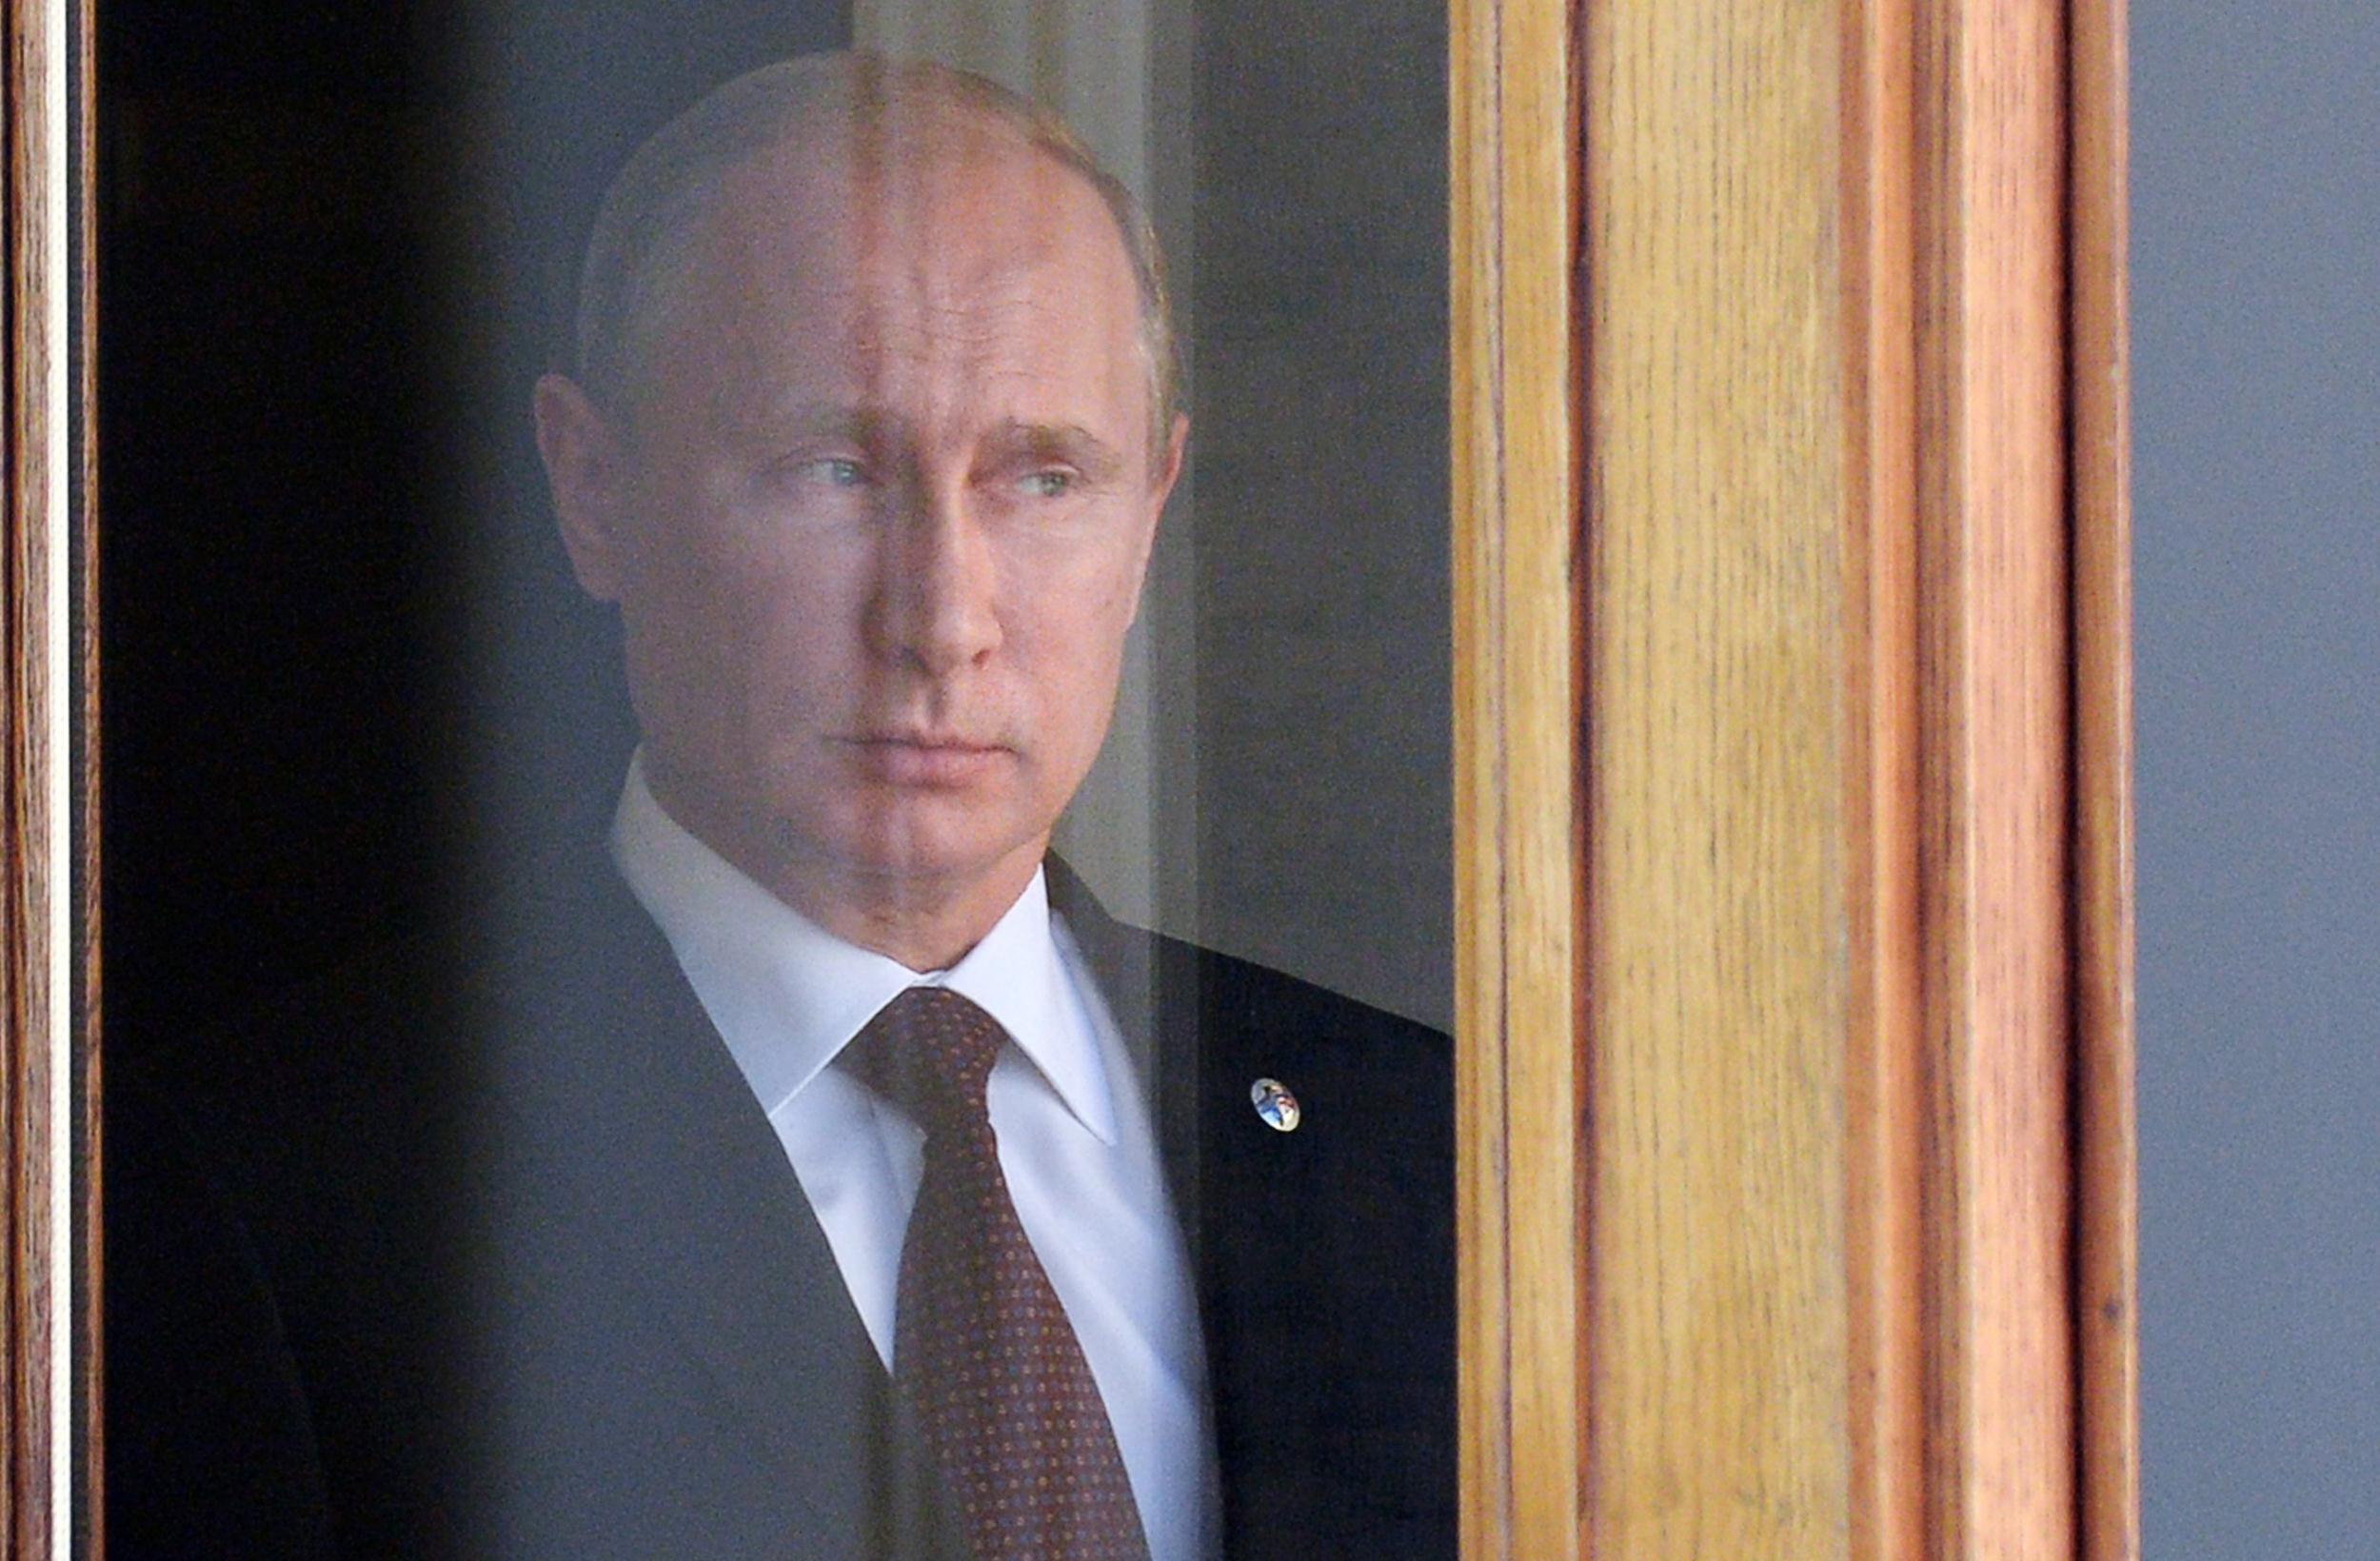 Image: Vladimir Putin